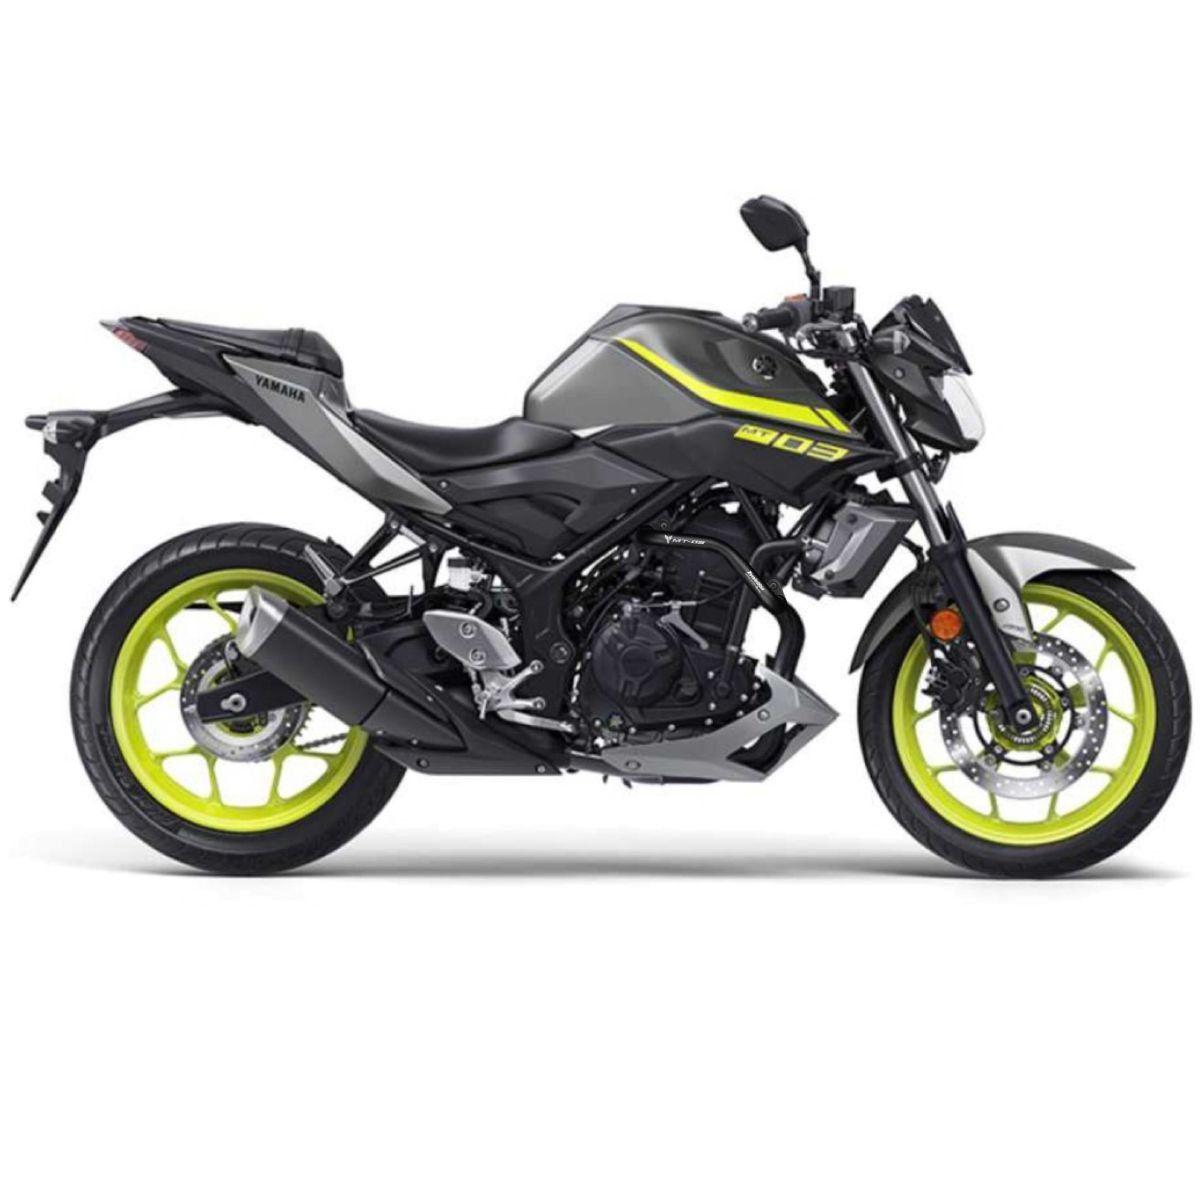 Protetor de Motor Carenagem Yamaha MT 03 2015 2016 2017 2018 2019 2020